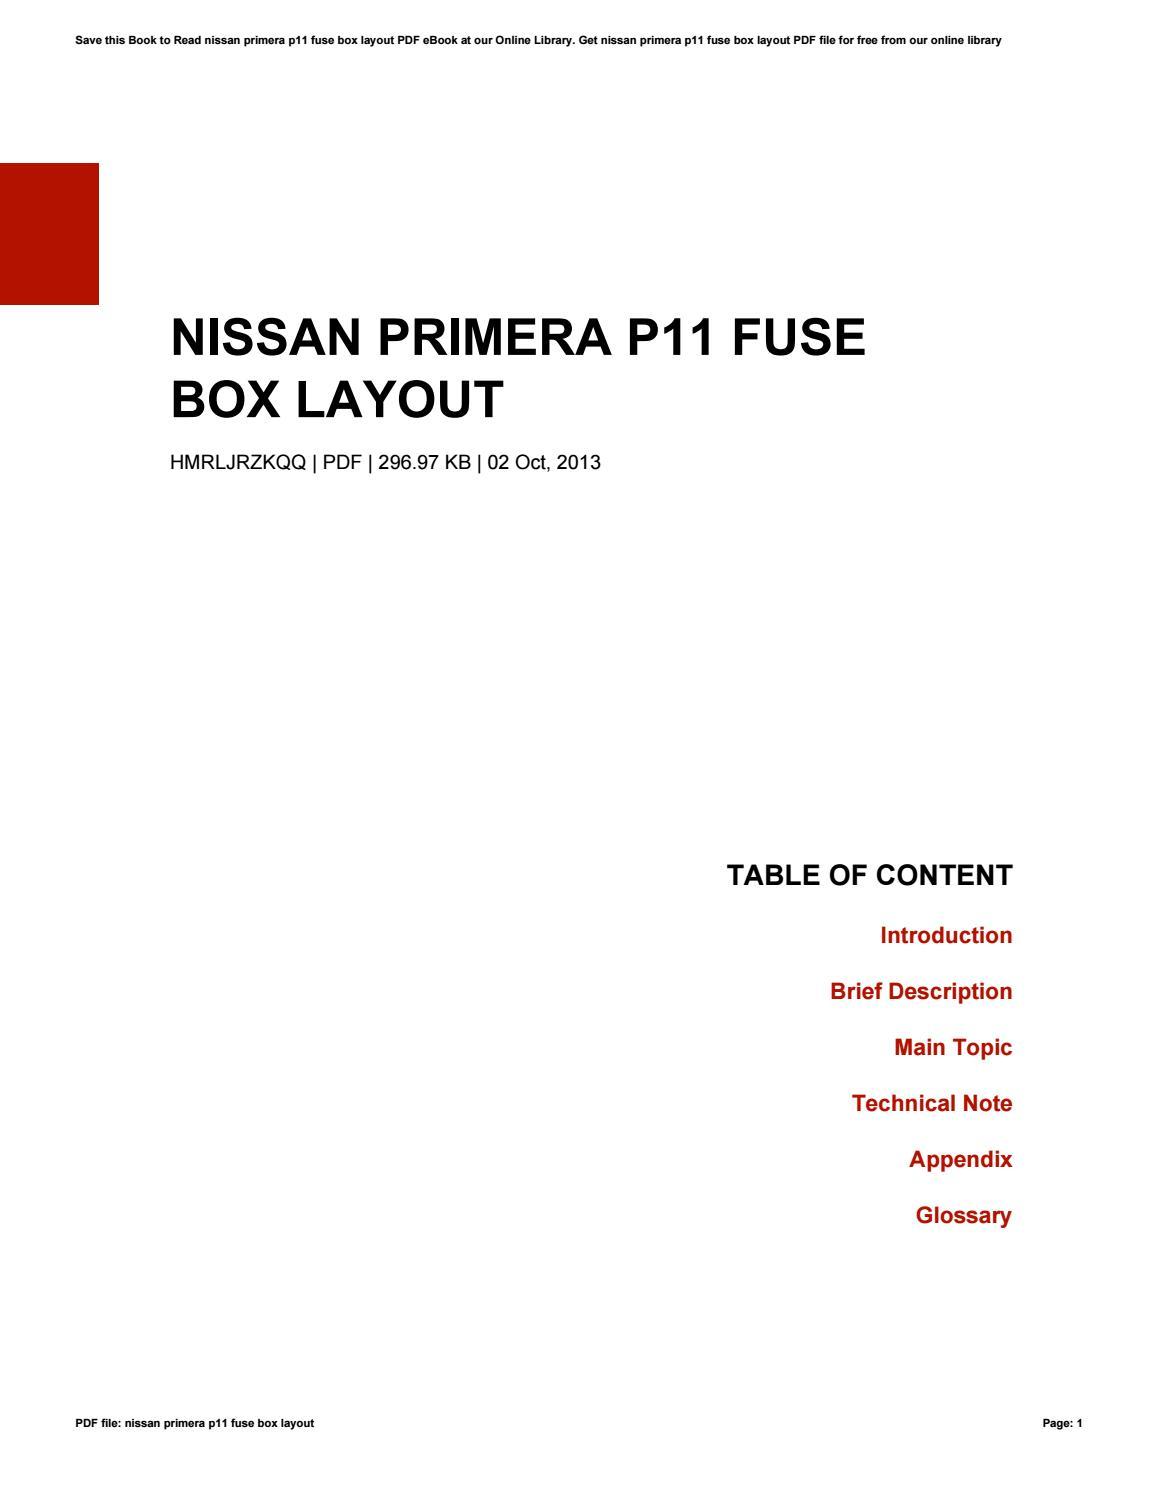 nissan primera p11 fuse box layout by linda